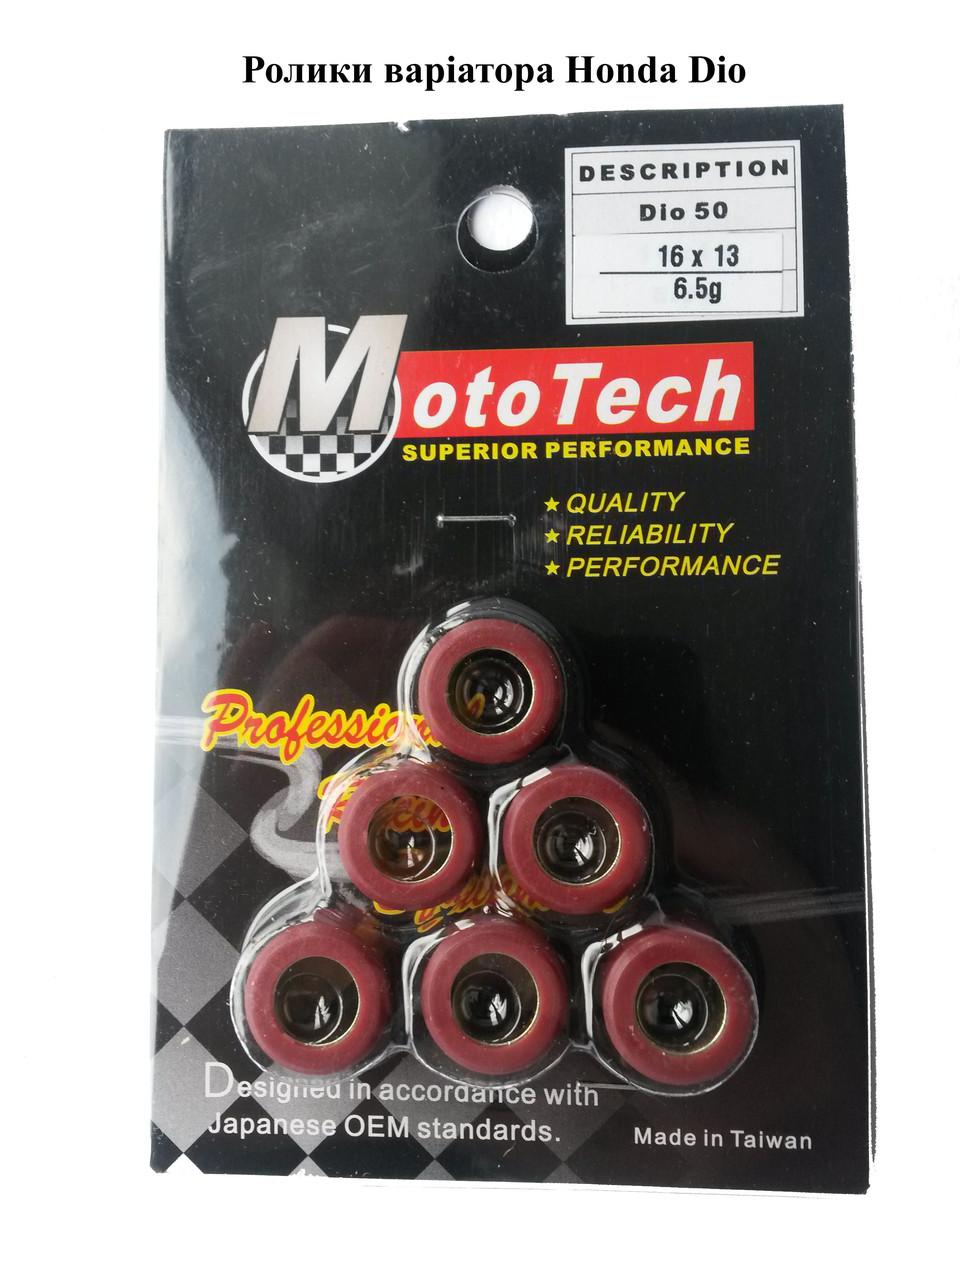 Ролики вариатора 16*13 Honda DIO 50 6,5г Mototech